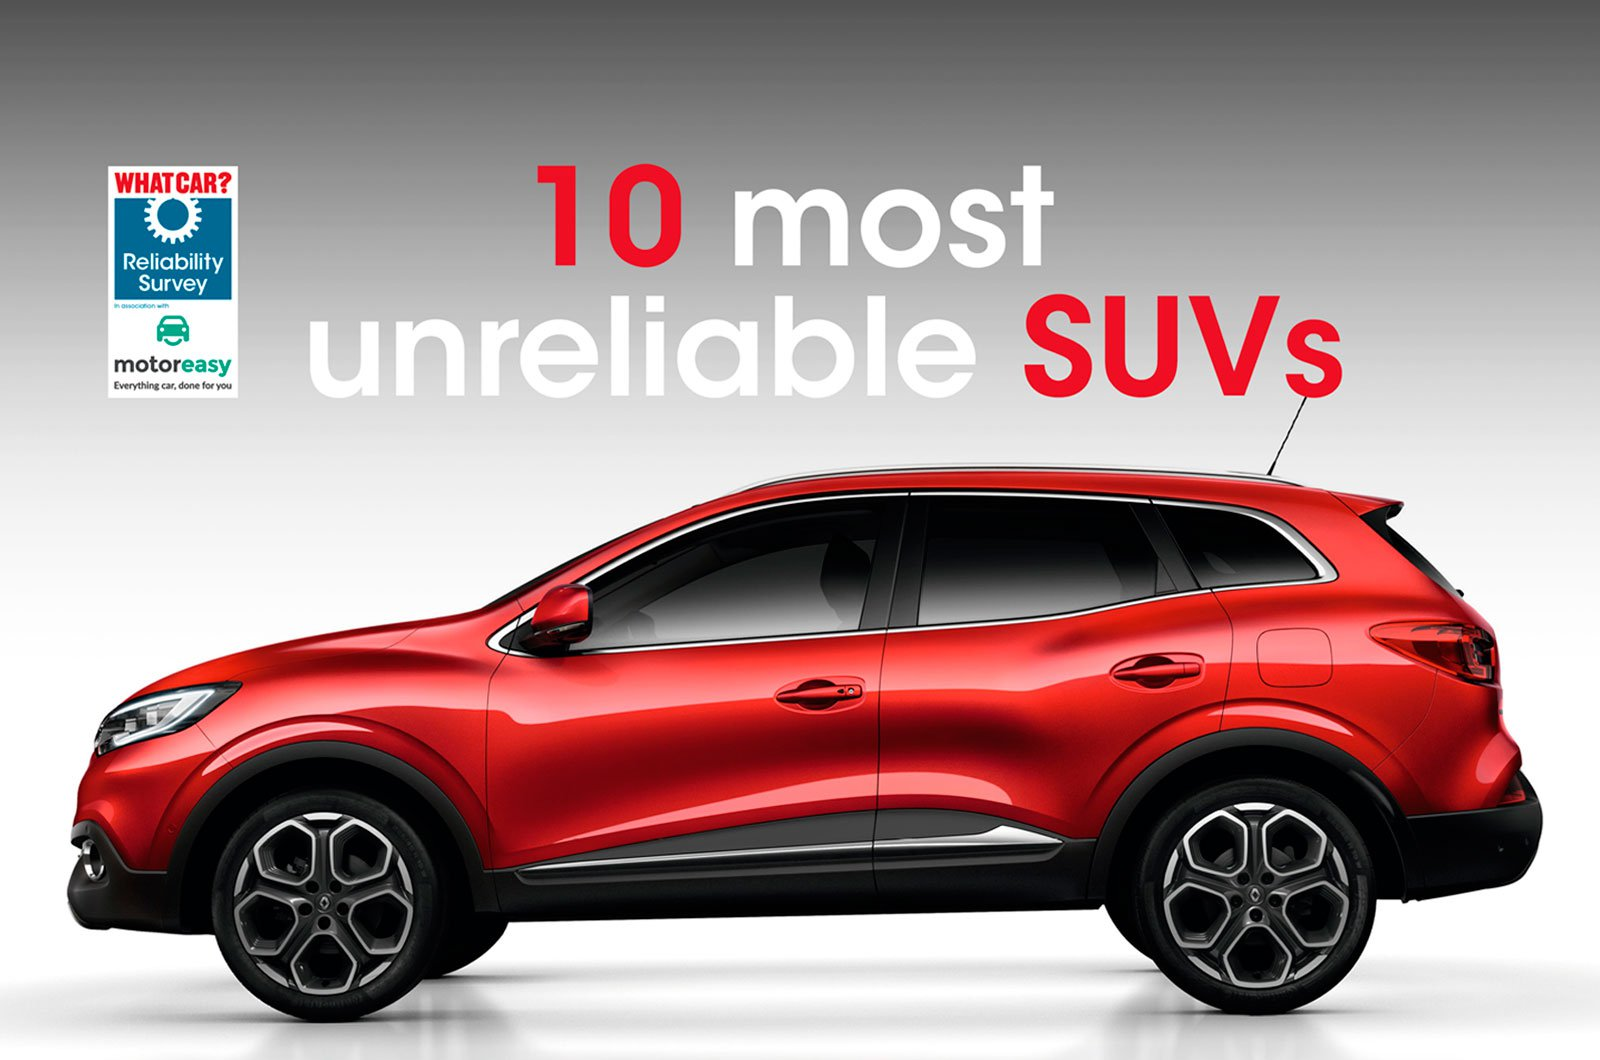 Most unreliable SUVs